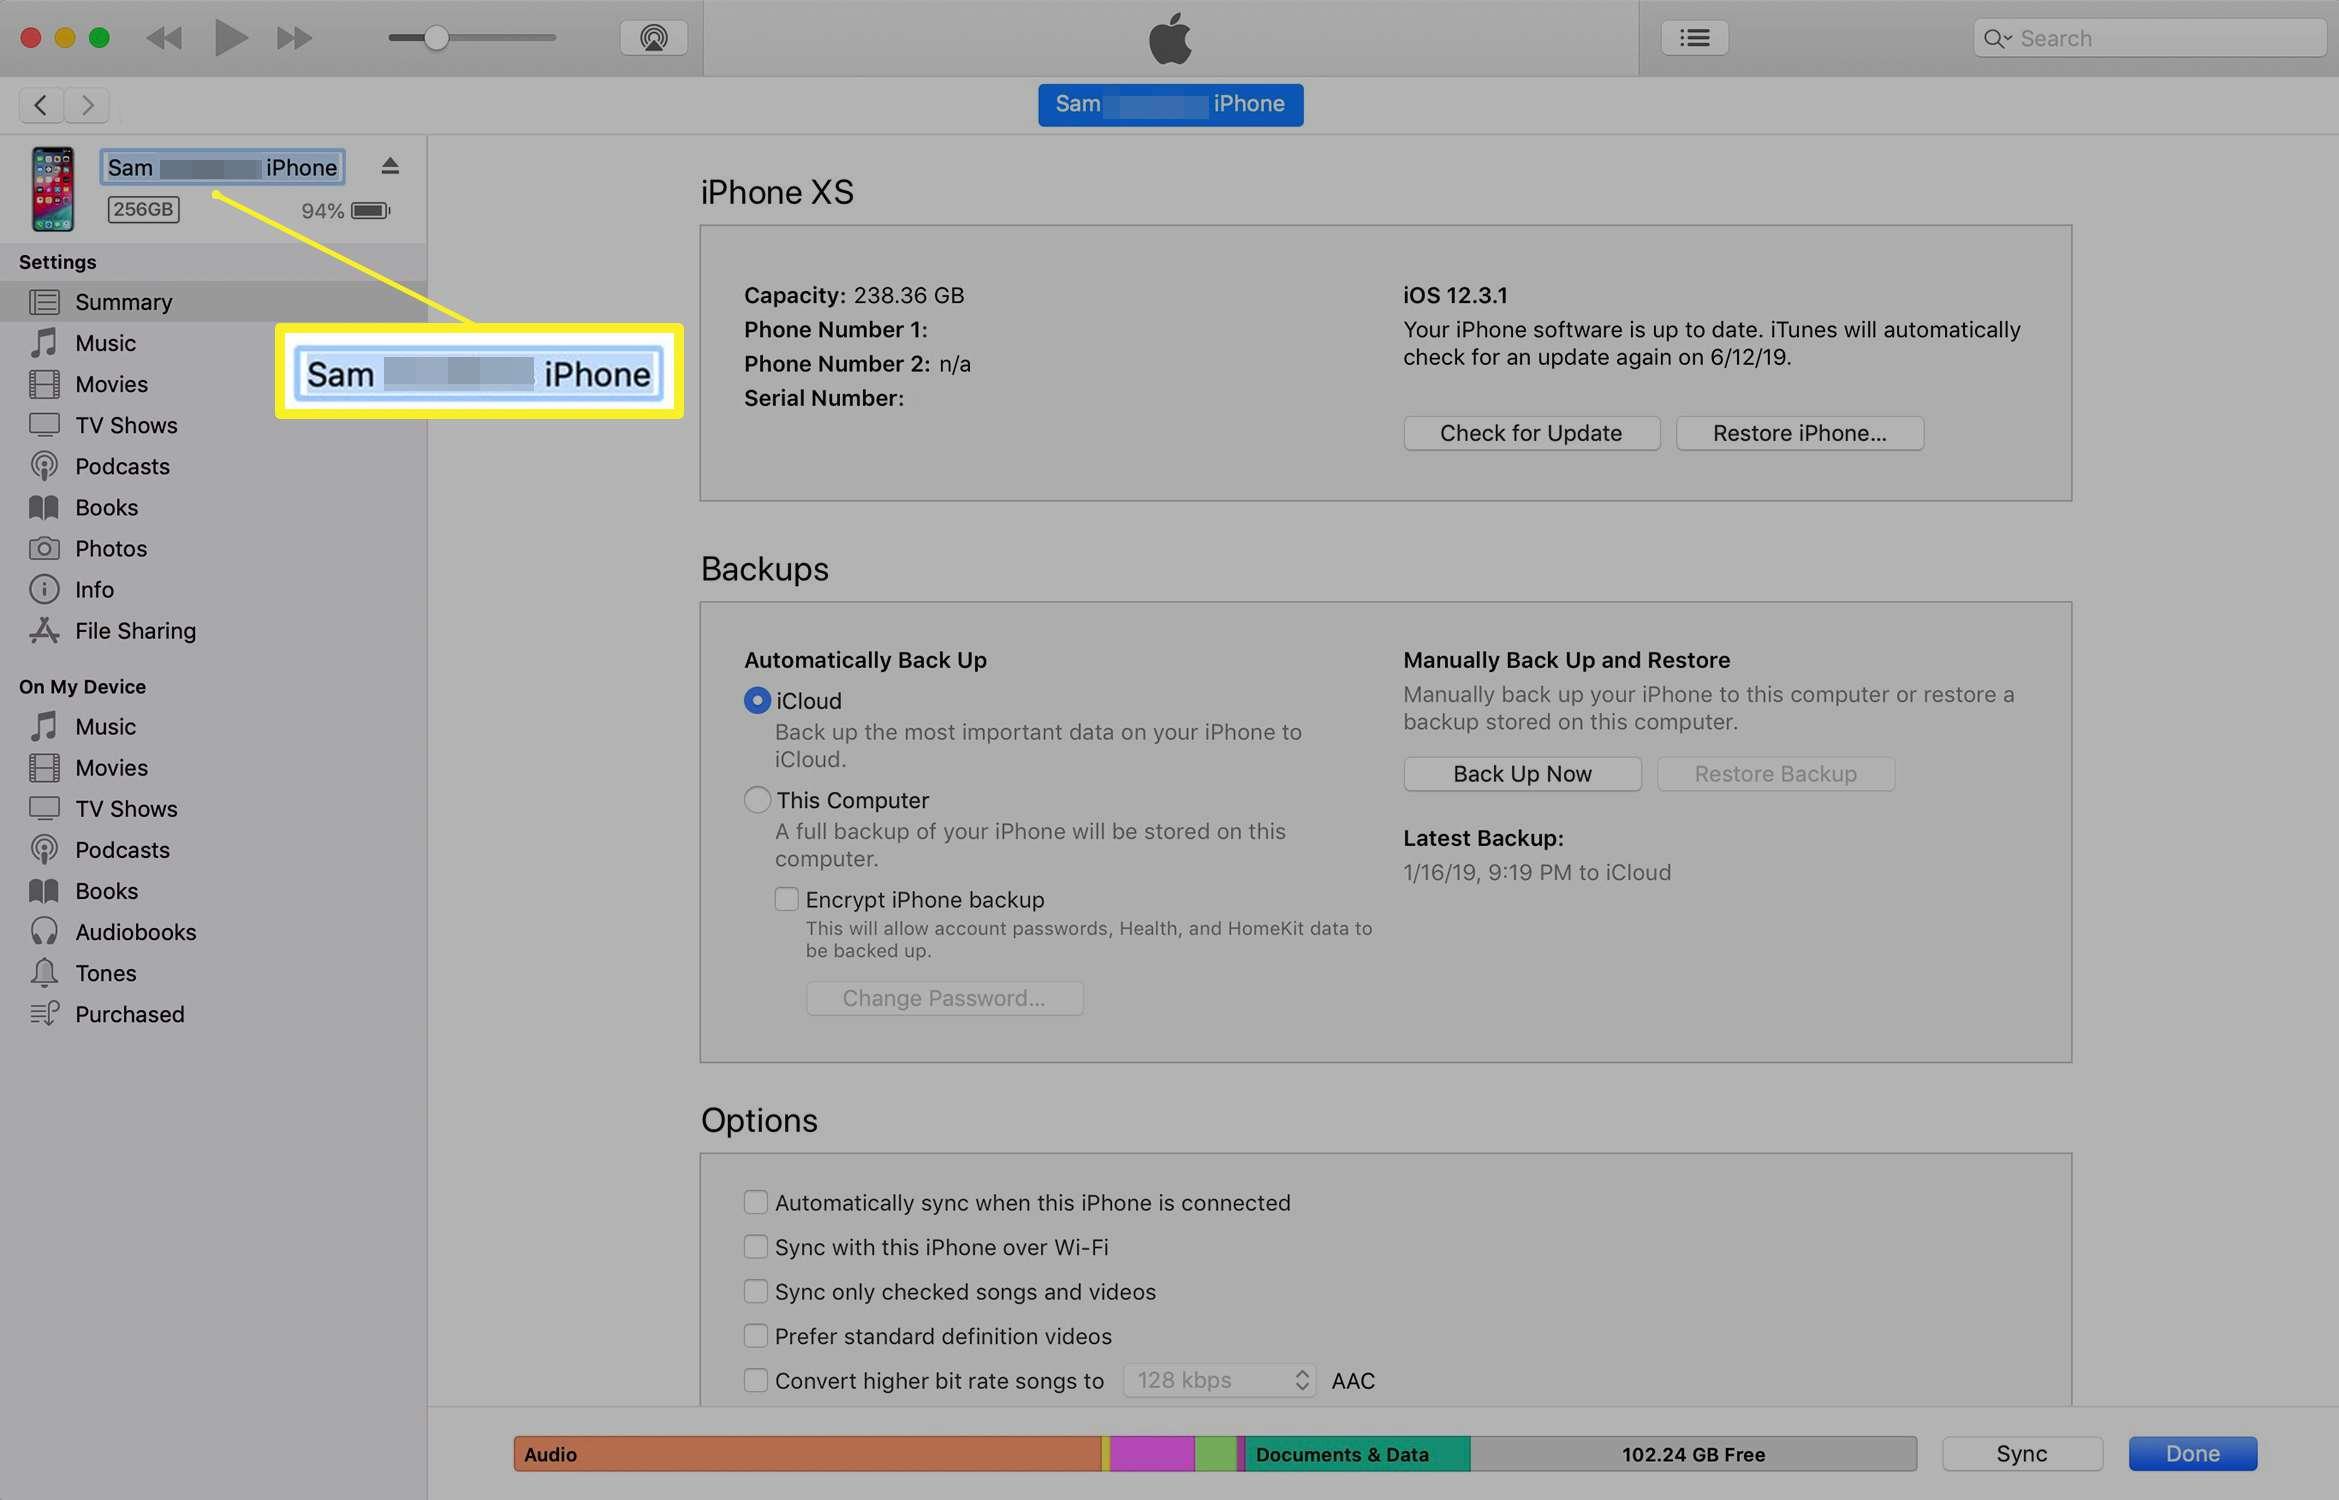 iTunes screen